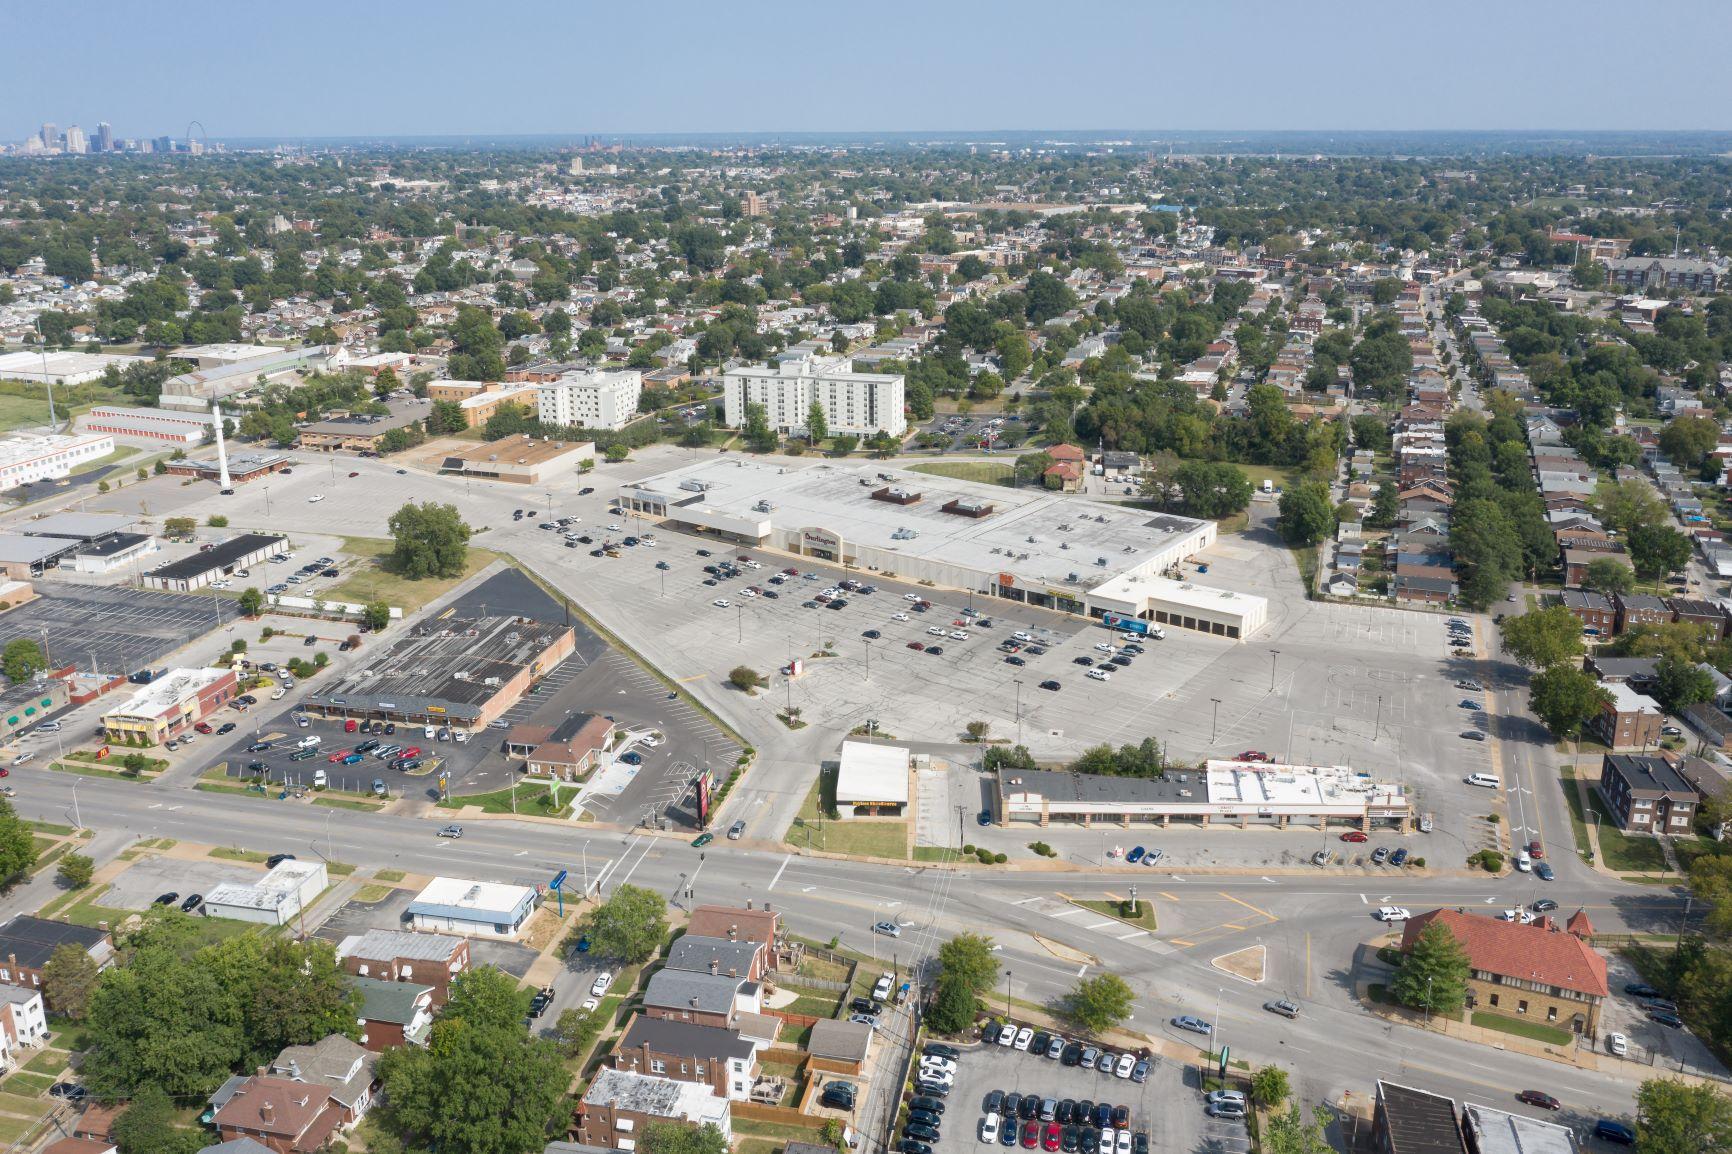 King's Highway Shopping Center